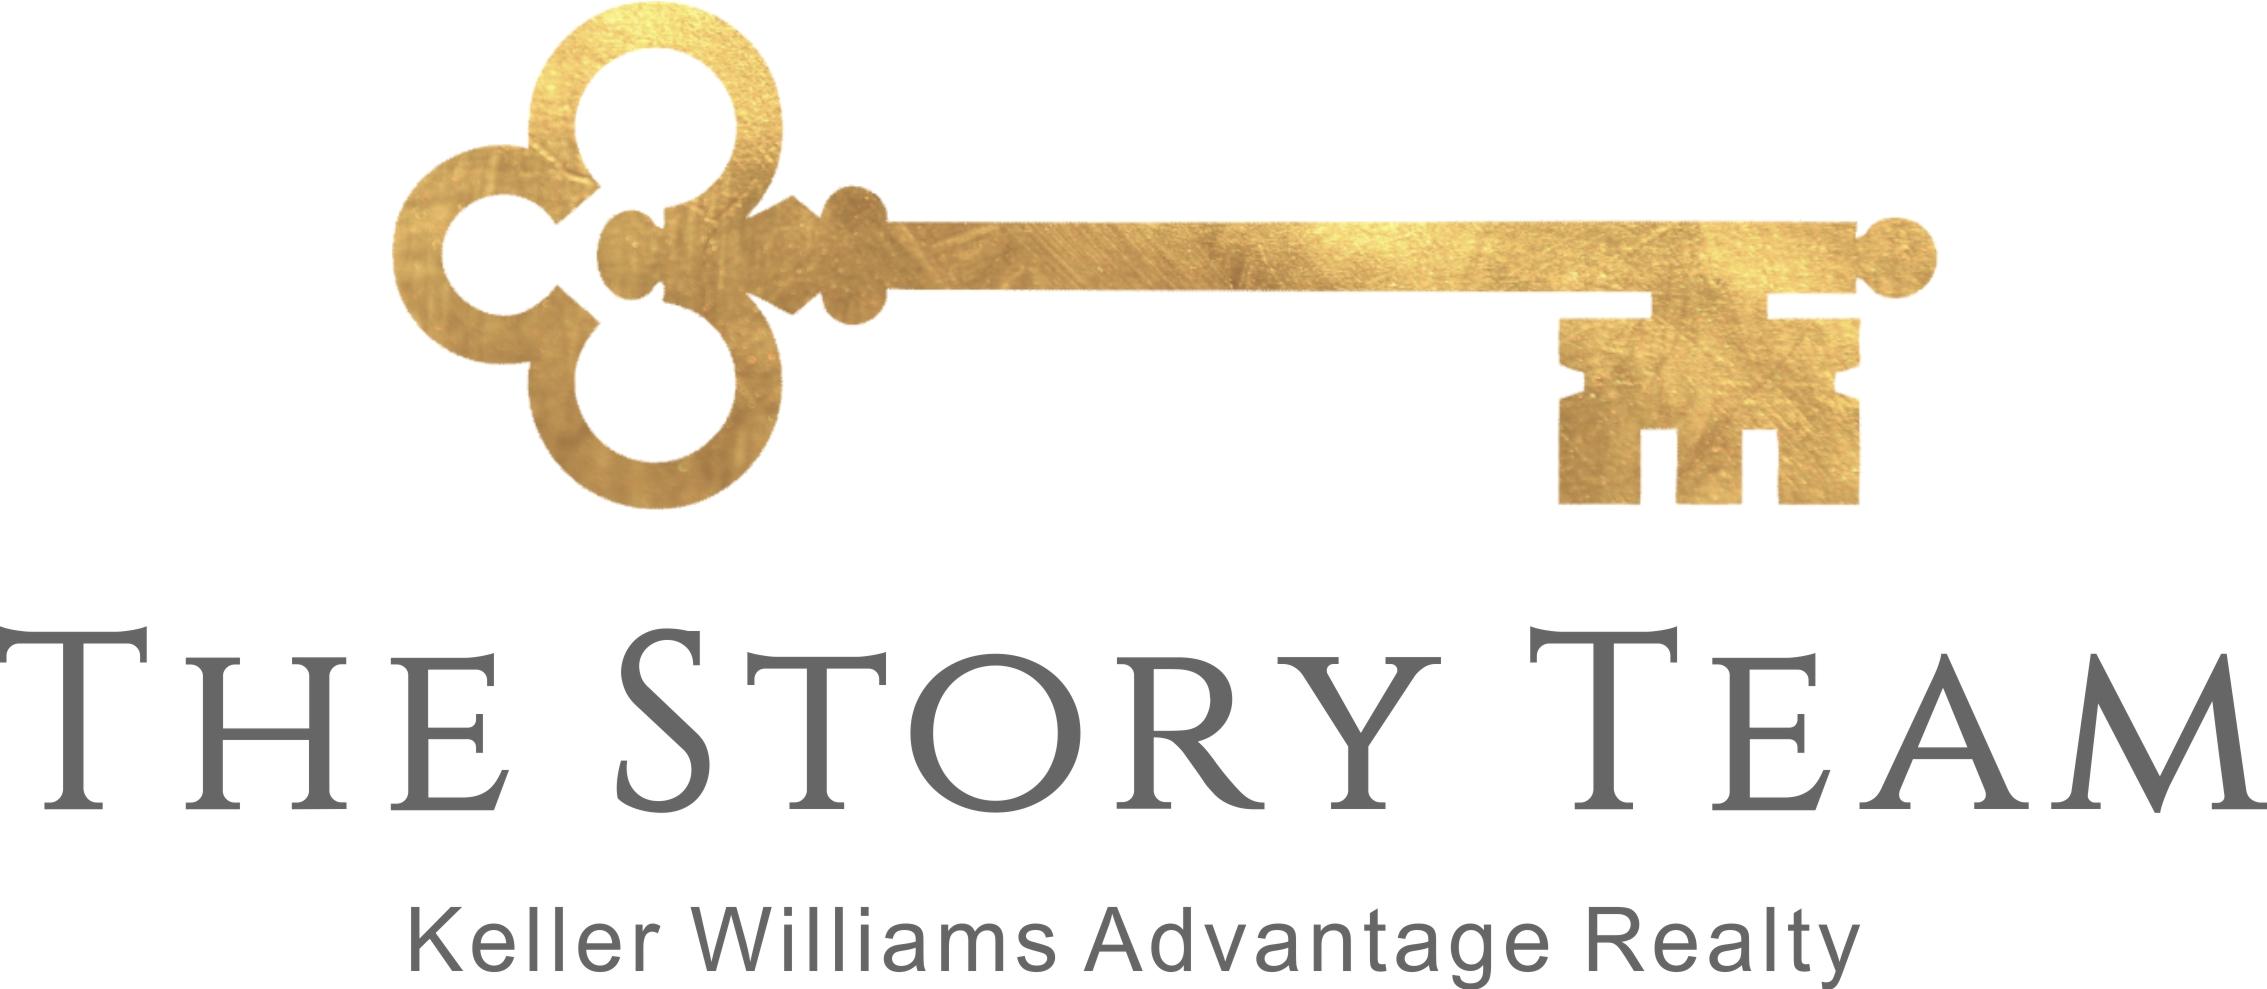 The Story Team | Keller Williams Advantage Realty